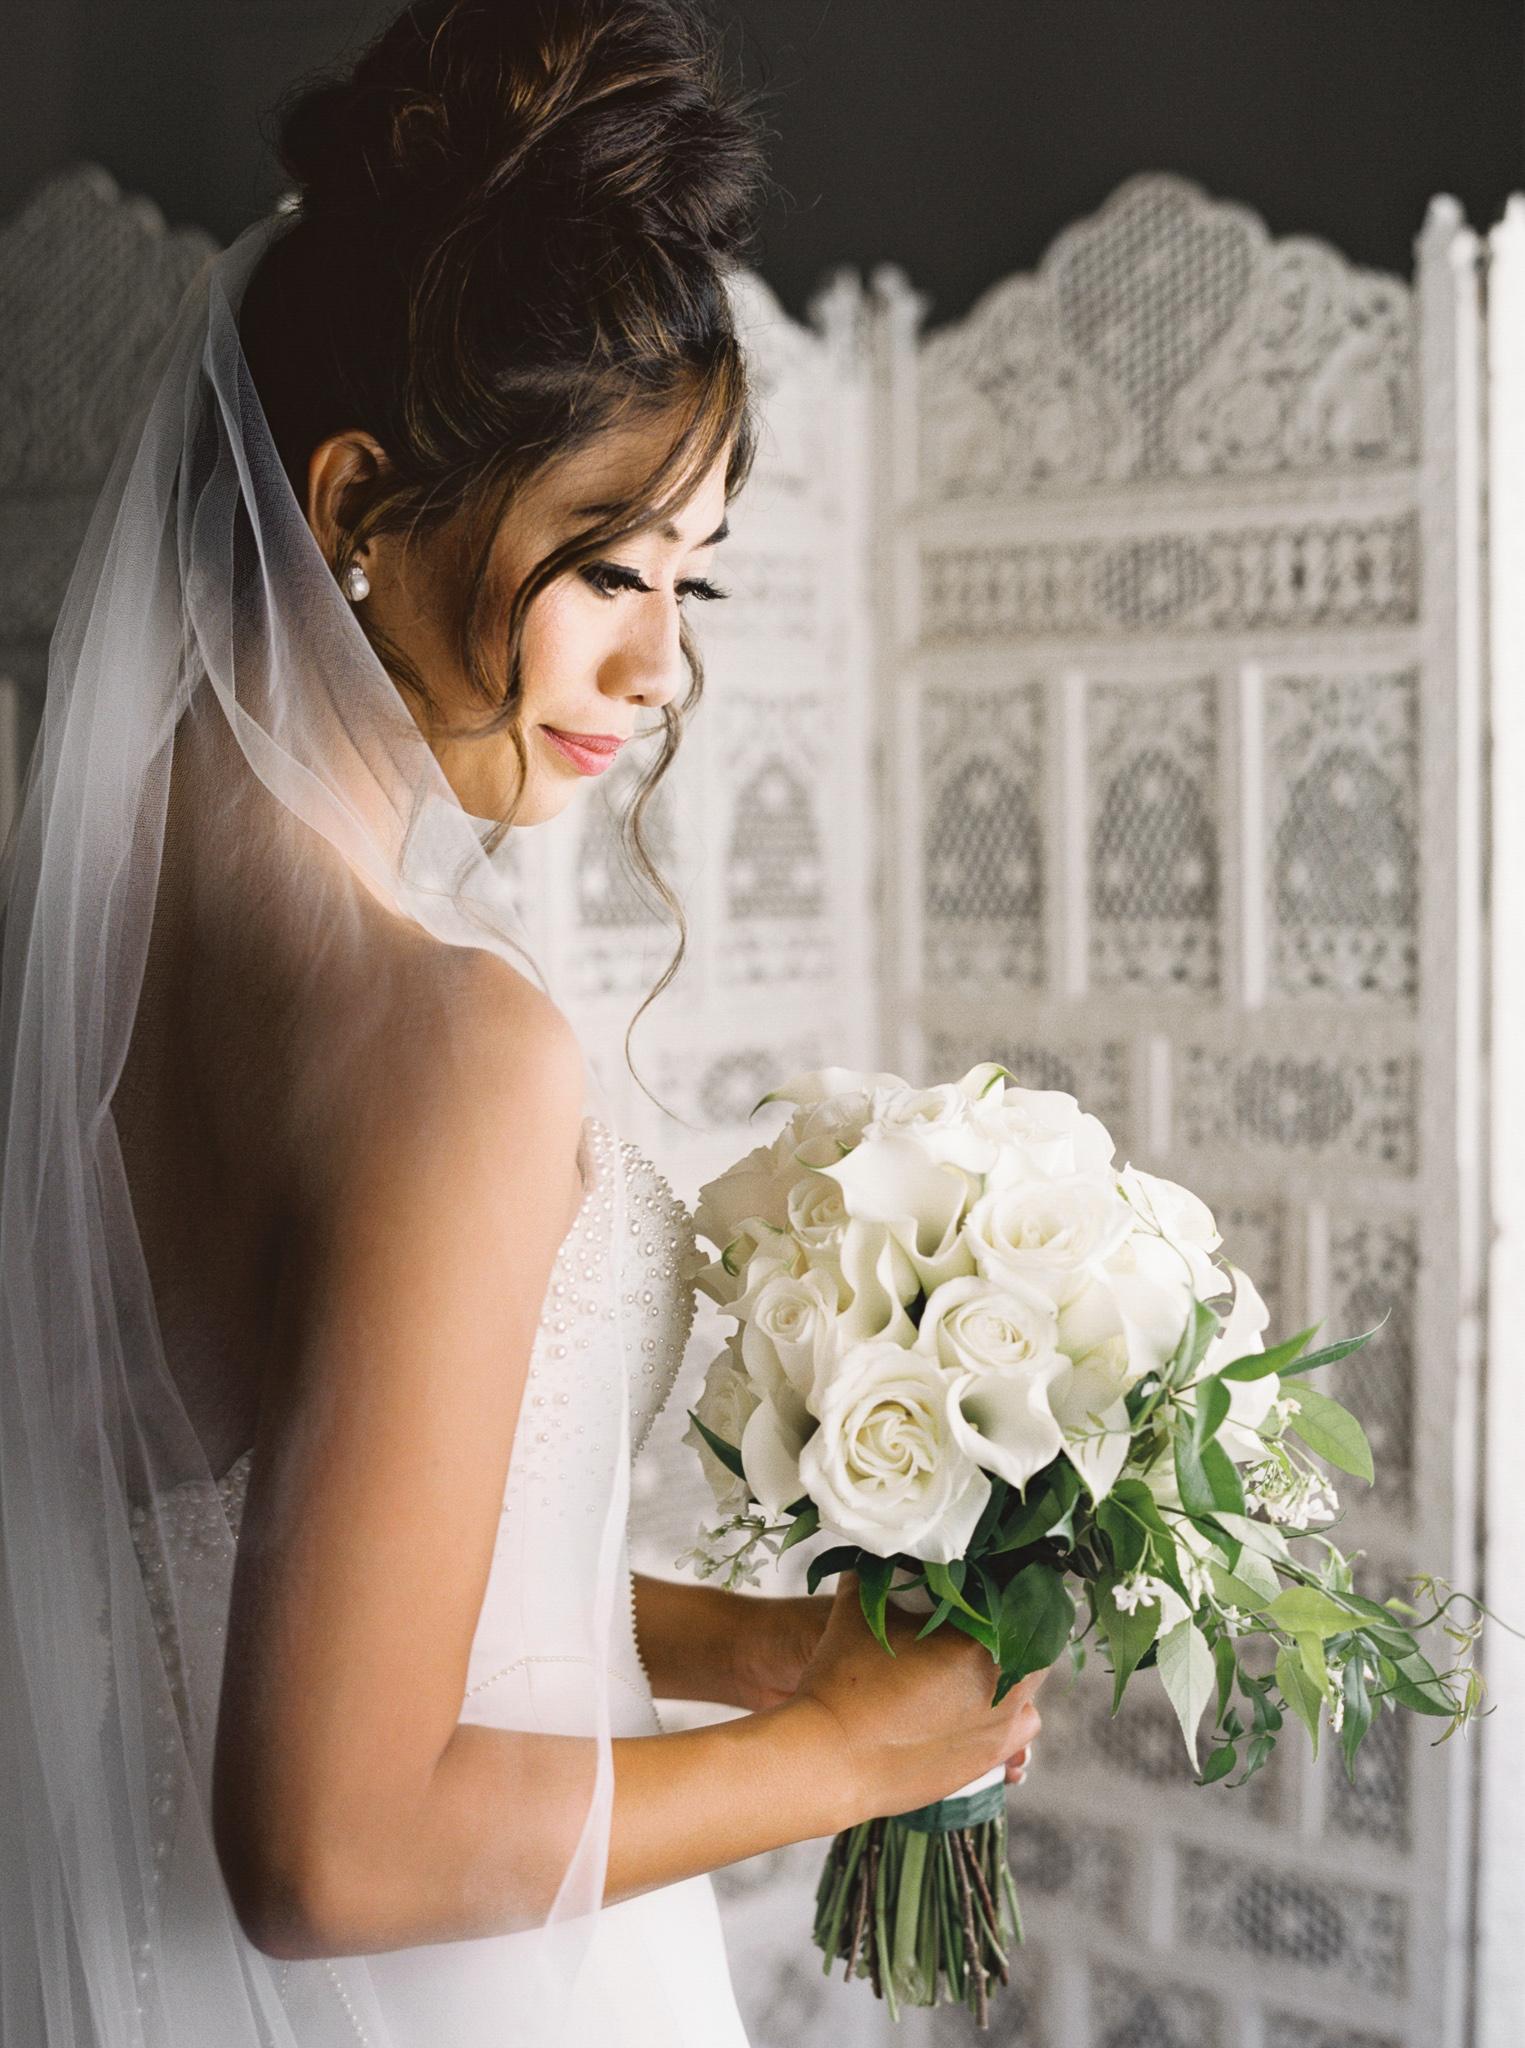 019OutliveCreative_Travel_Photographer_Videographer_Lewis&Clark_Oregon_Elegant_BlackTie_Destination_Wedding.jpg